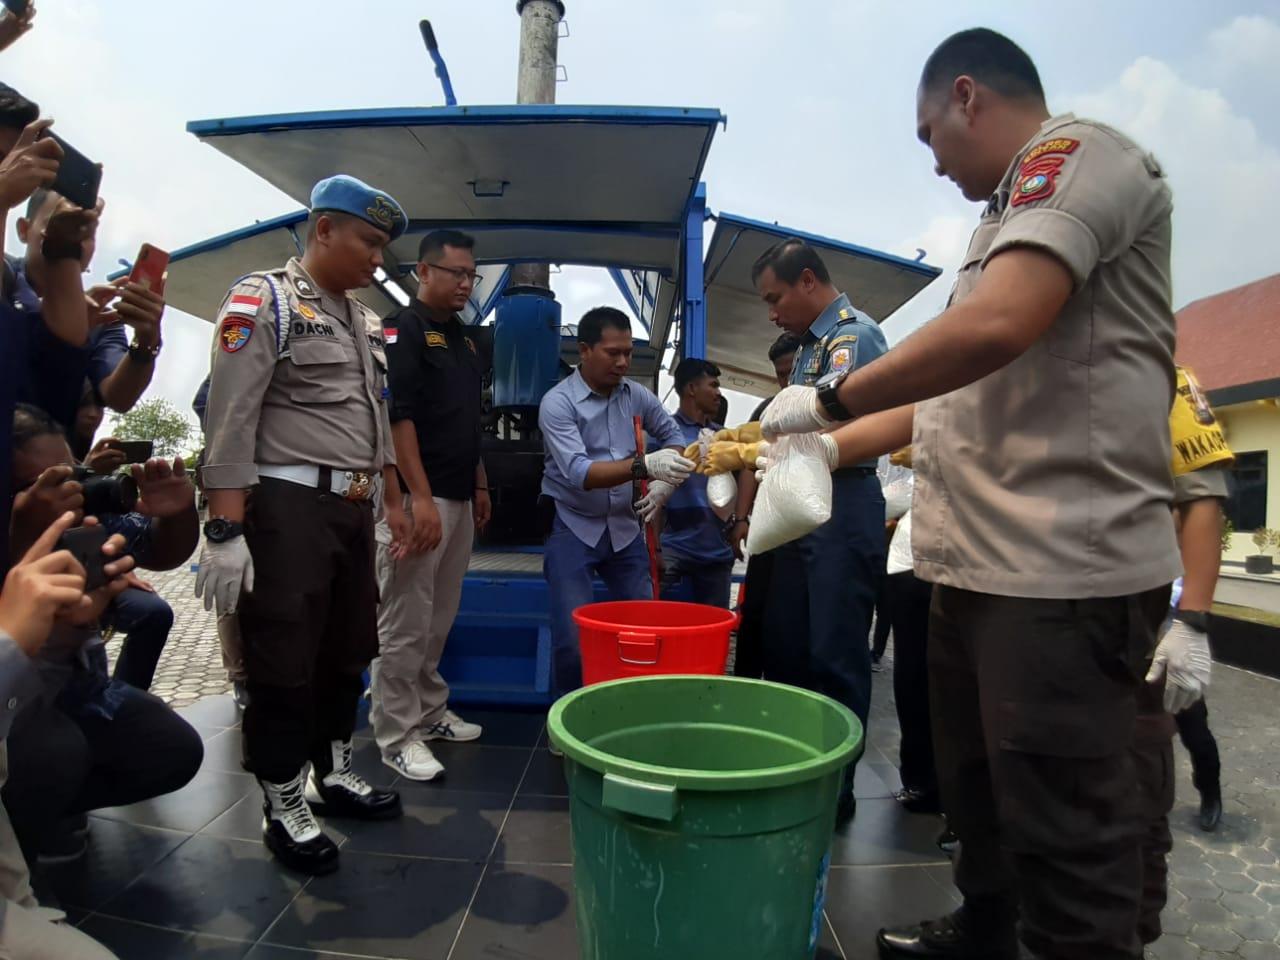 Polres Bintan Polda Kepri Musnakan Barang Bukti Narkotika Jenis Sabu Seberat 114,7 KG